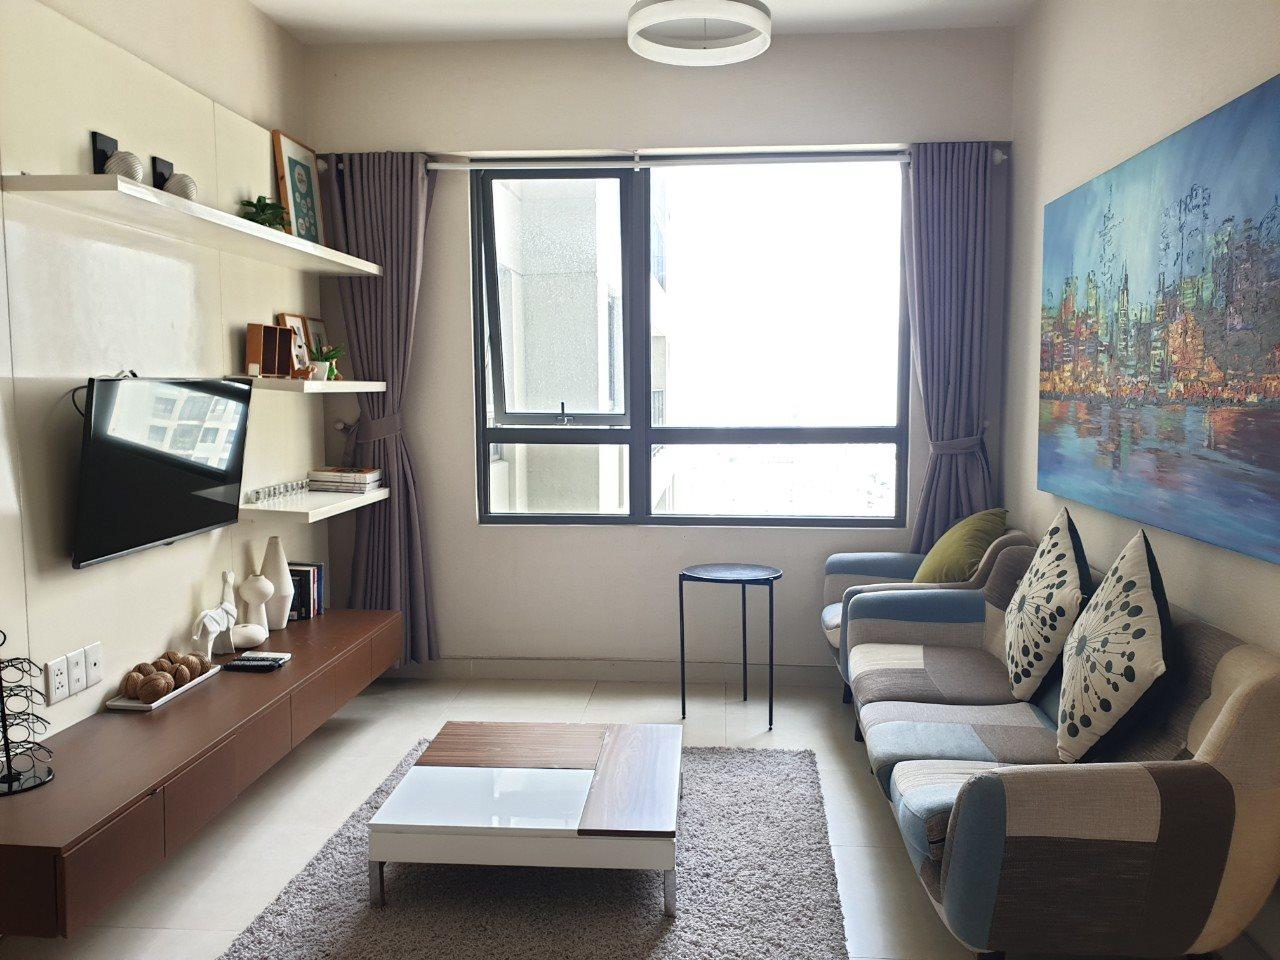 MTD86158 - Masteri Thao Dien Apartment For Rent - Best Price For Long-term - 2 bedroom